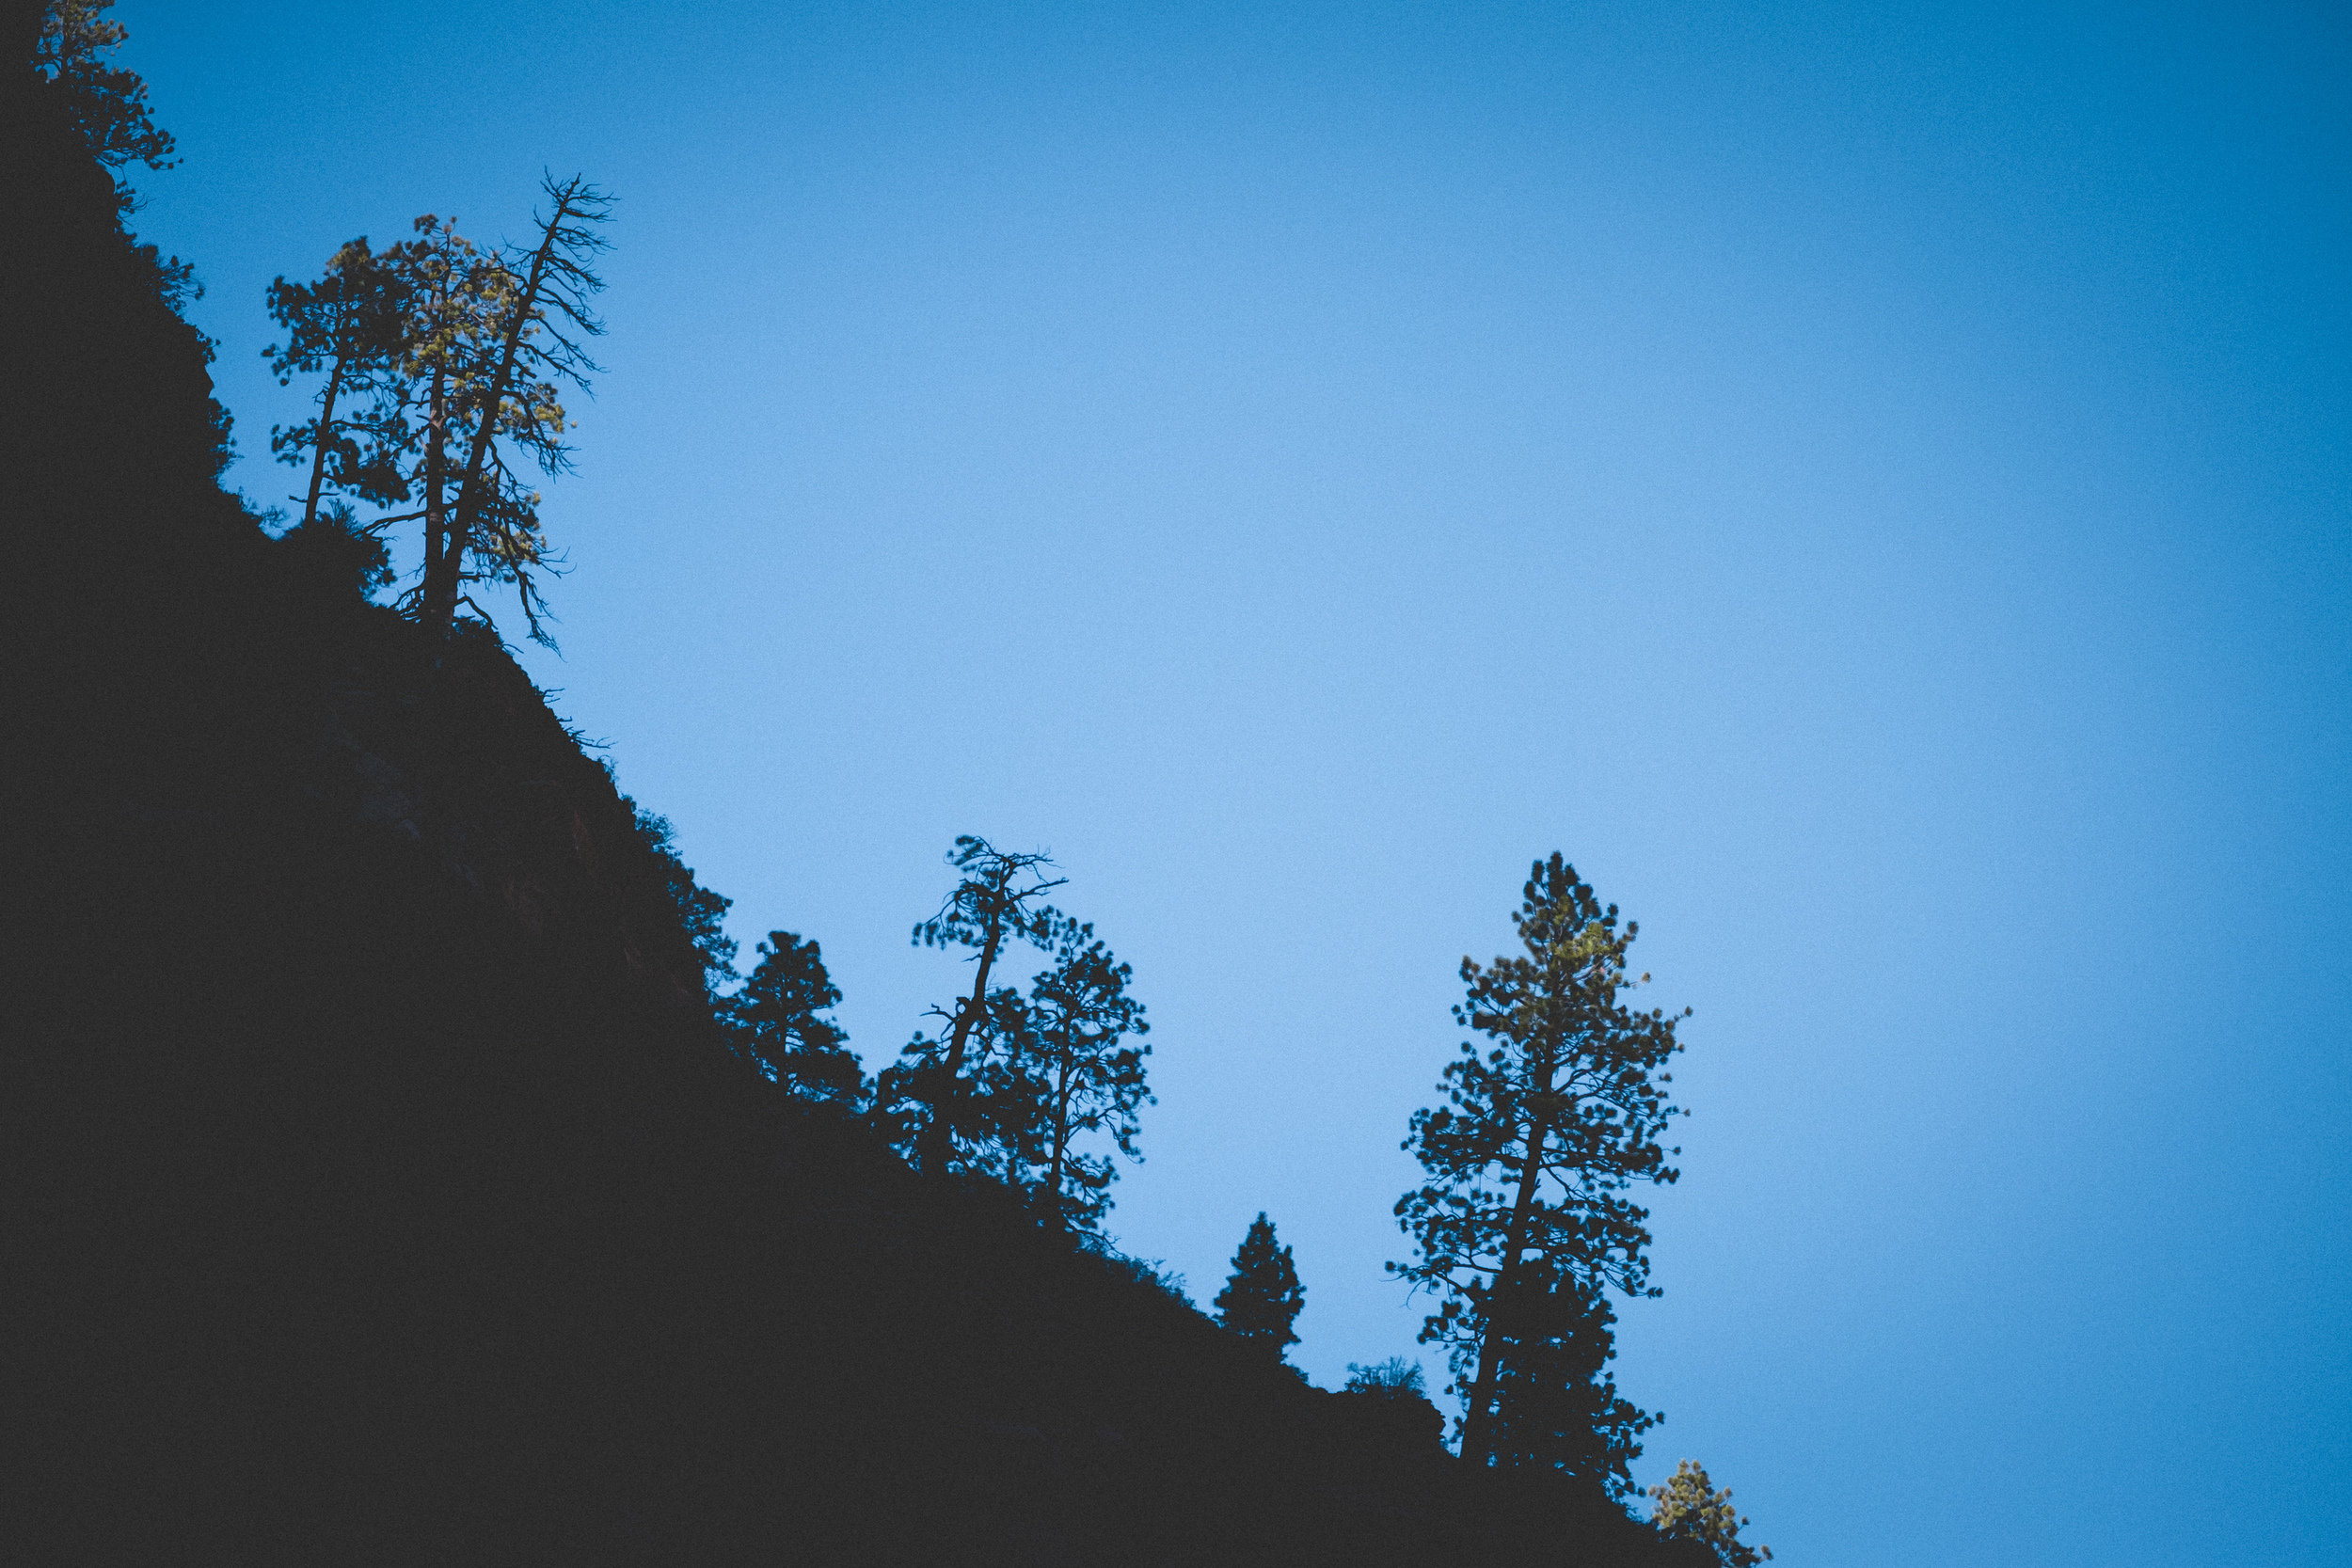 Zion-National-Park-84.jpg